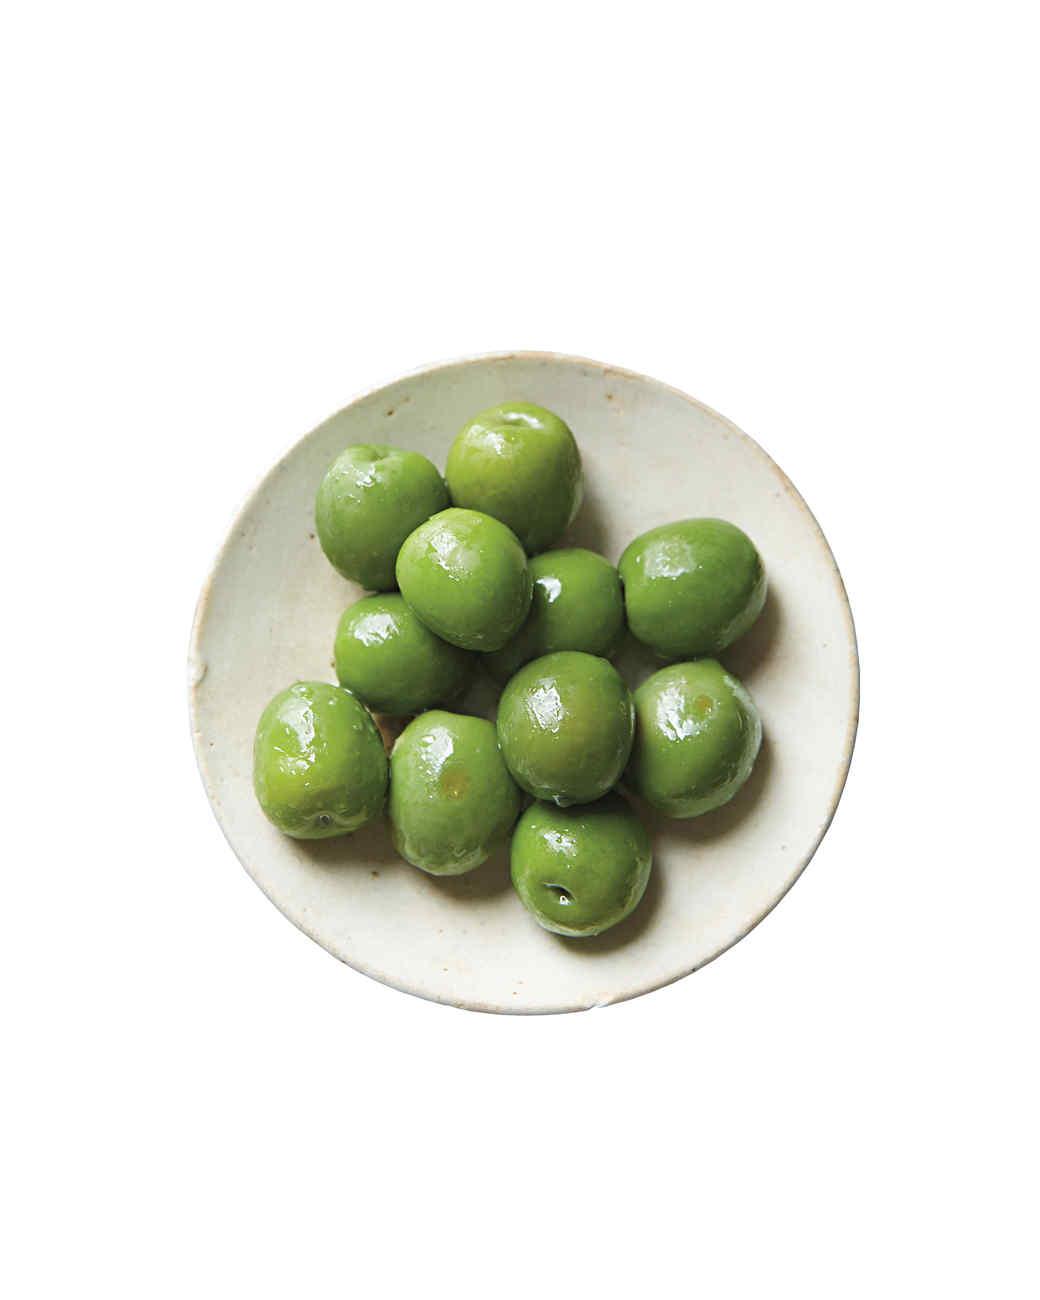 olives-056-d112734-l-0416.jpg